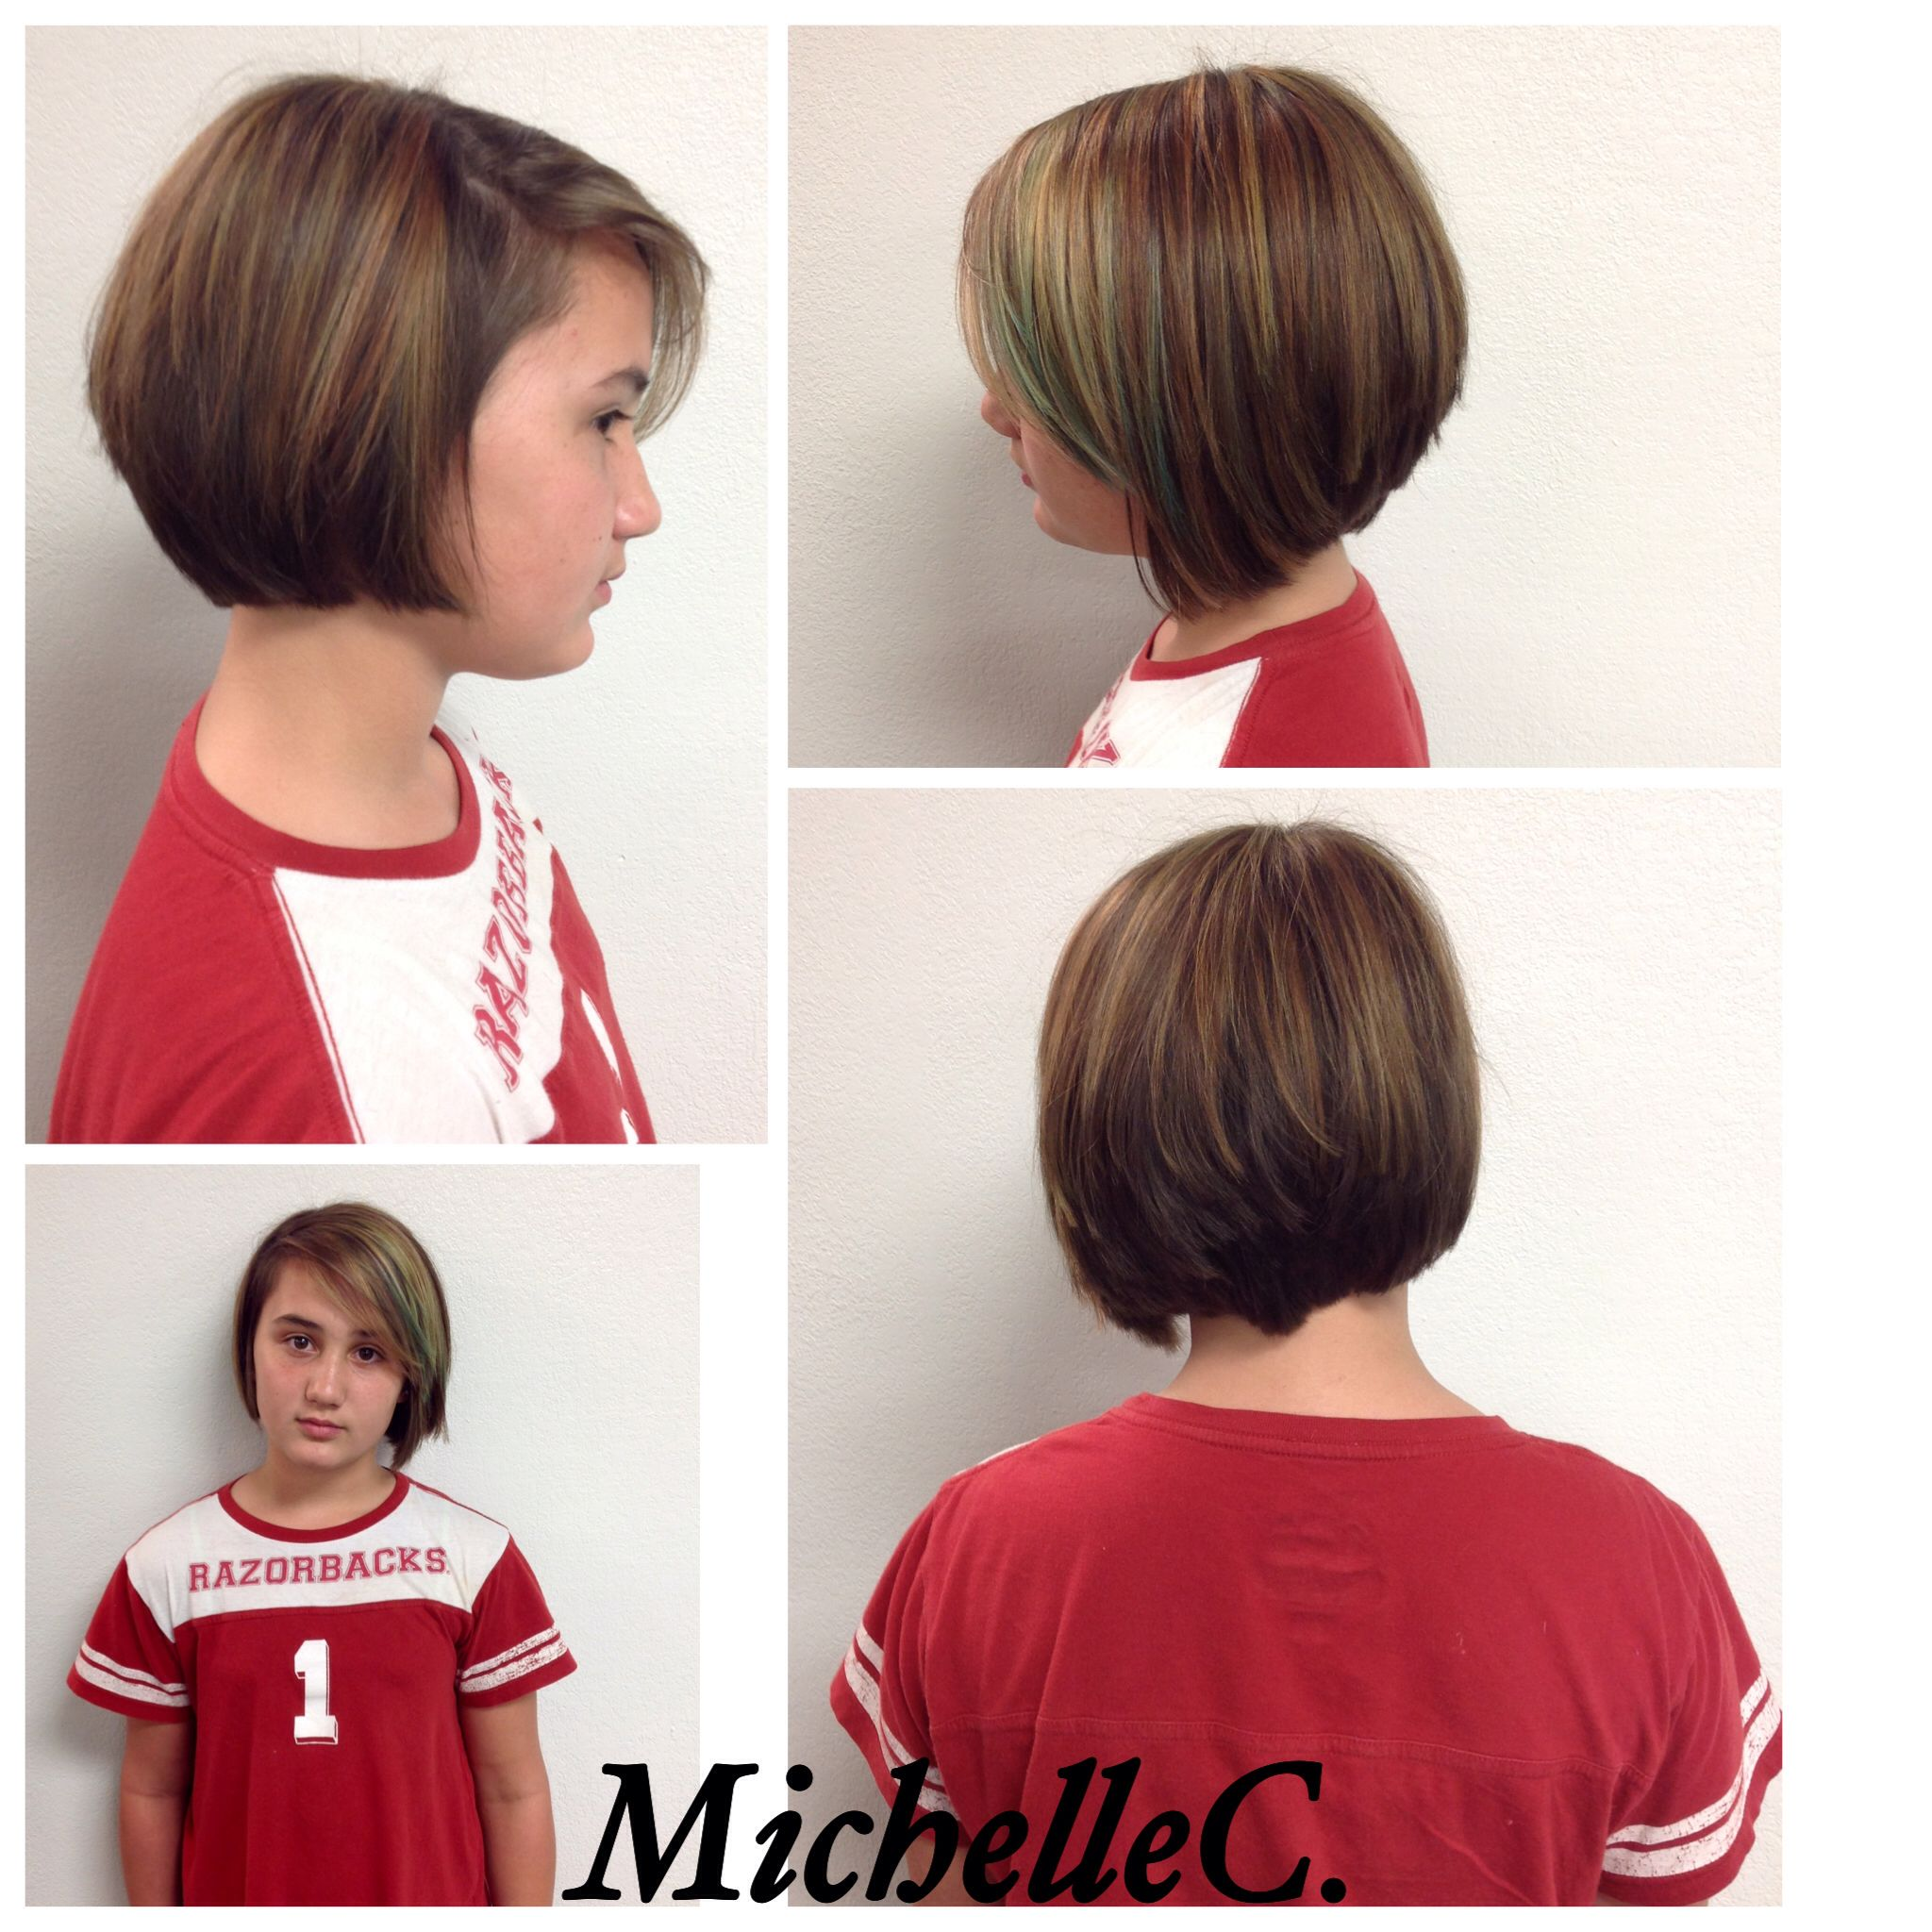 Triangular Graduation On A 9 Year Old Old Hairstyles 9 Year Old Hairstyles Bob Hairstyles